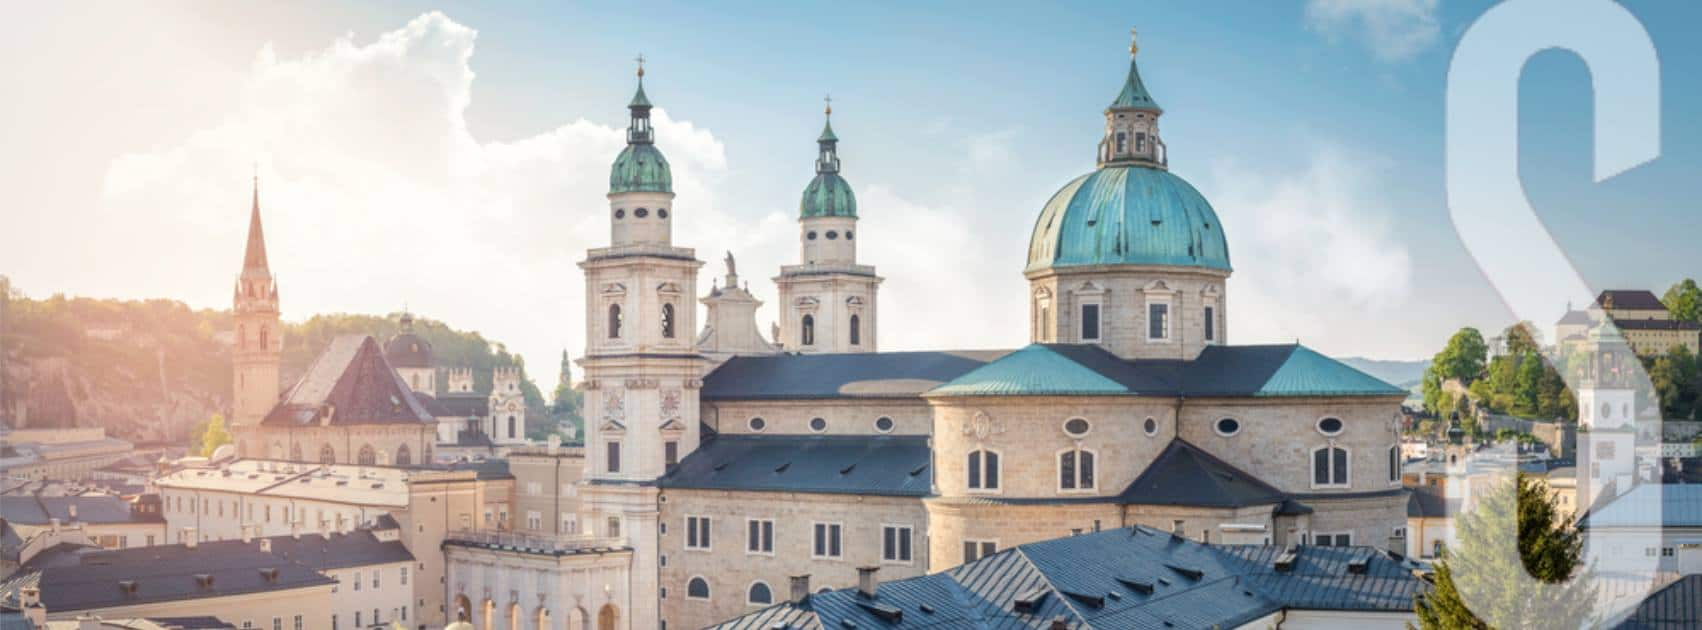 University of Salzburg Business School - SMBS Campus